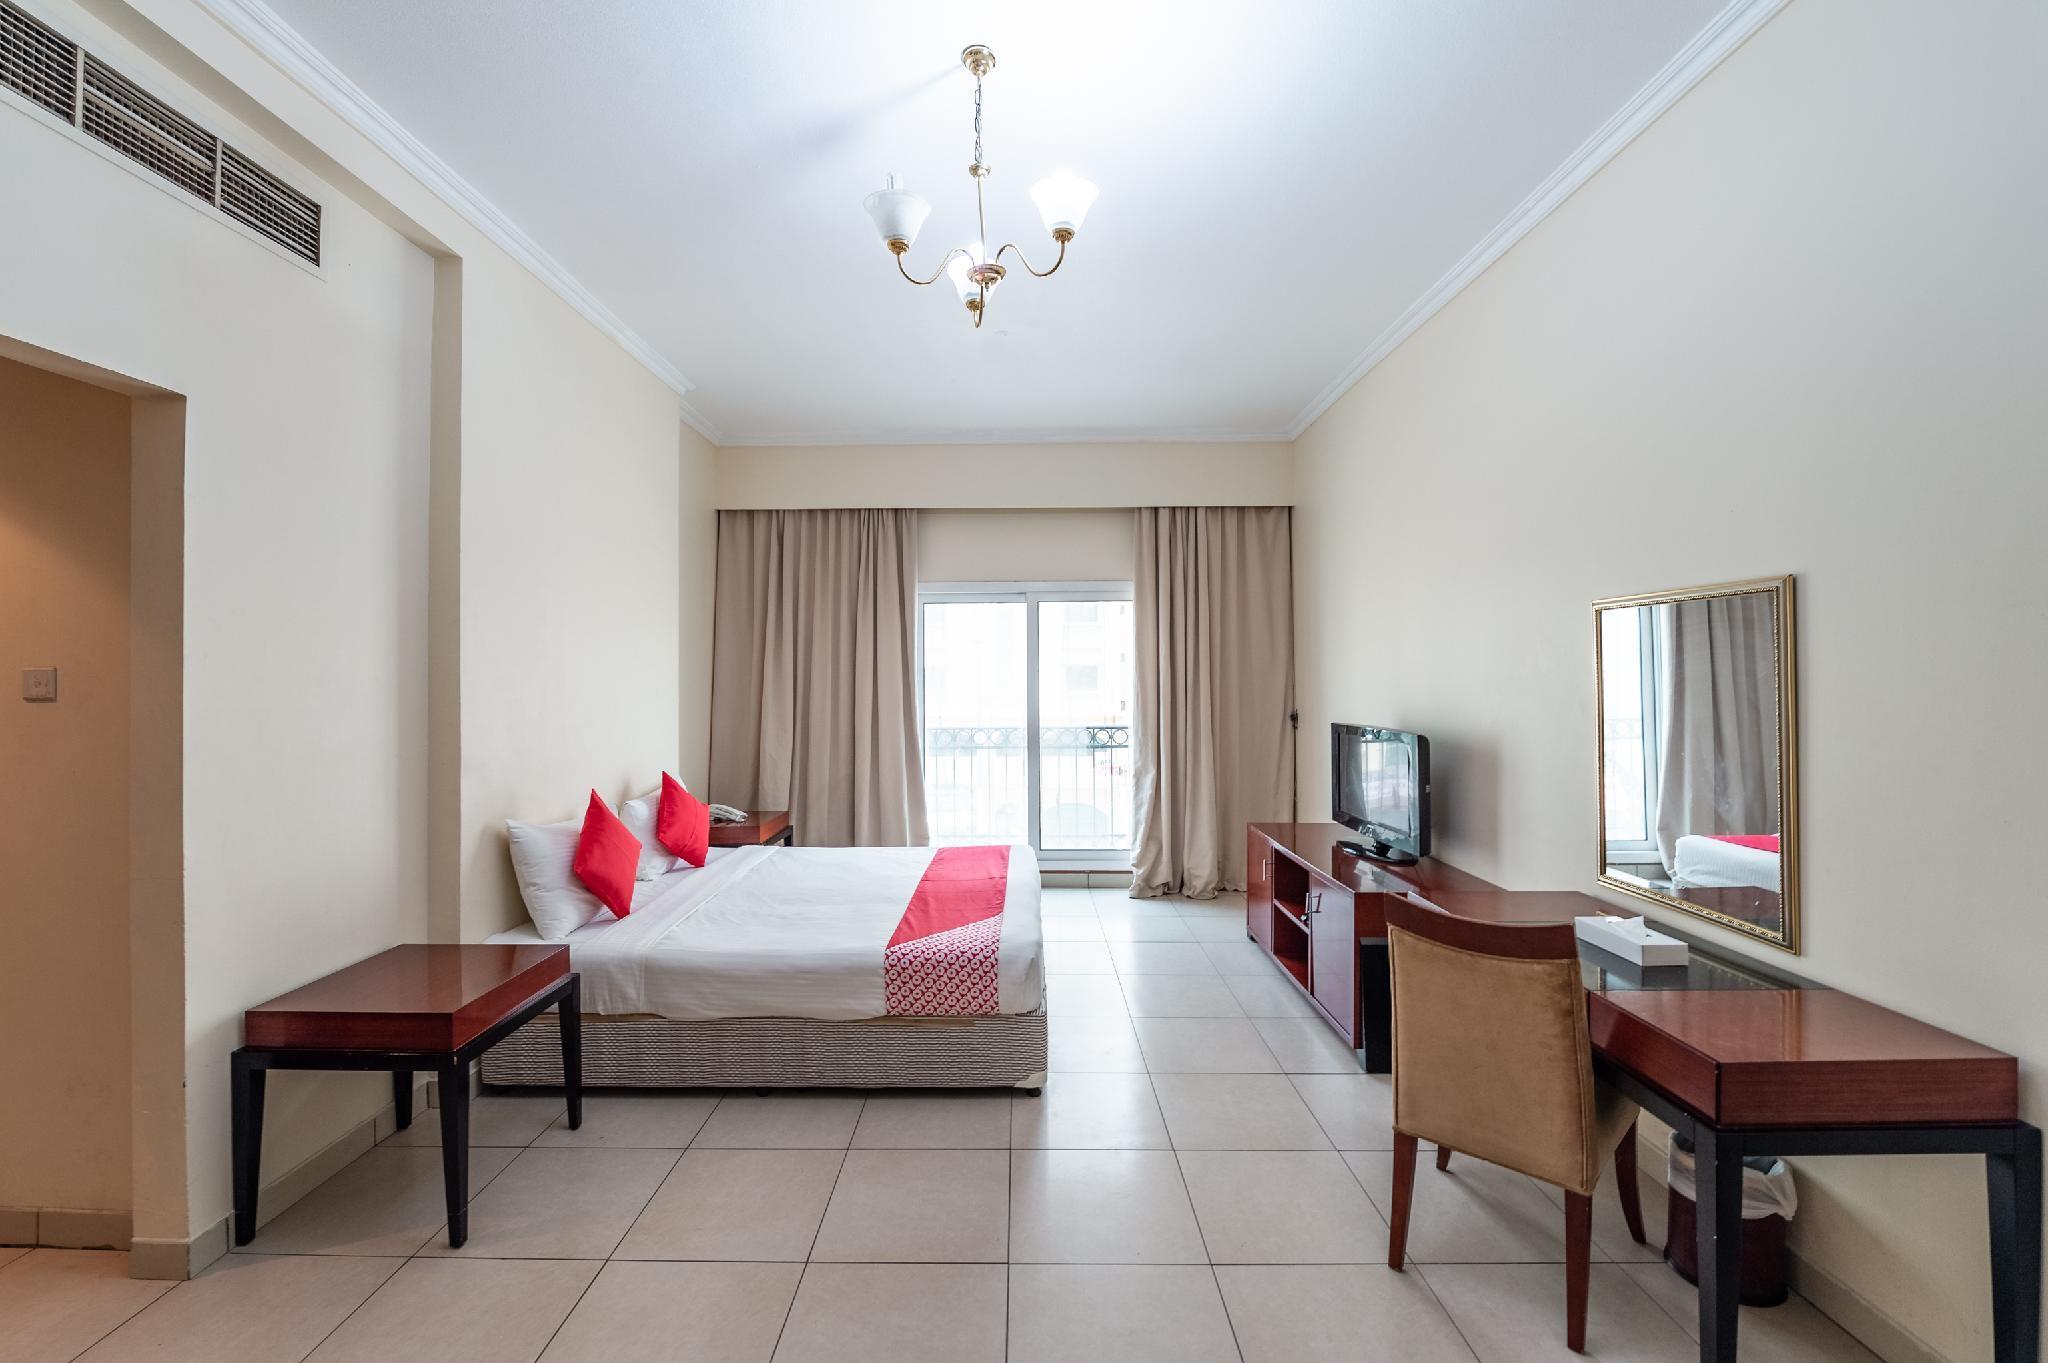 OYO 132 Ruwi Hotel Apartments – Sharjah 1